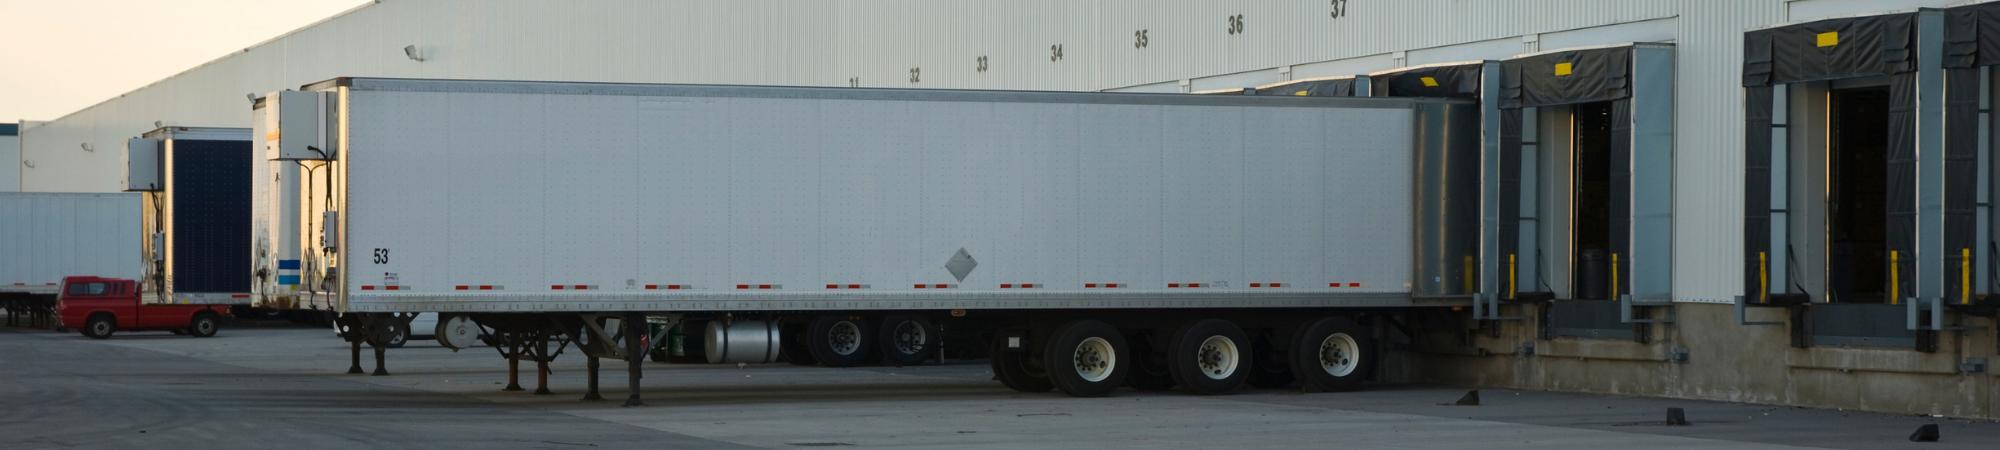 Best Truck Alignment Near me